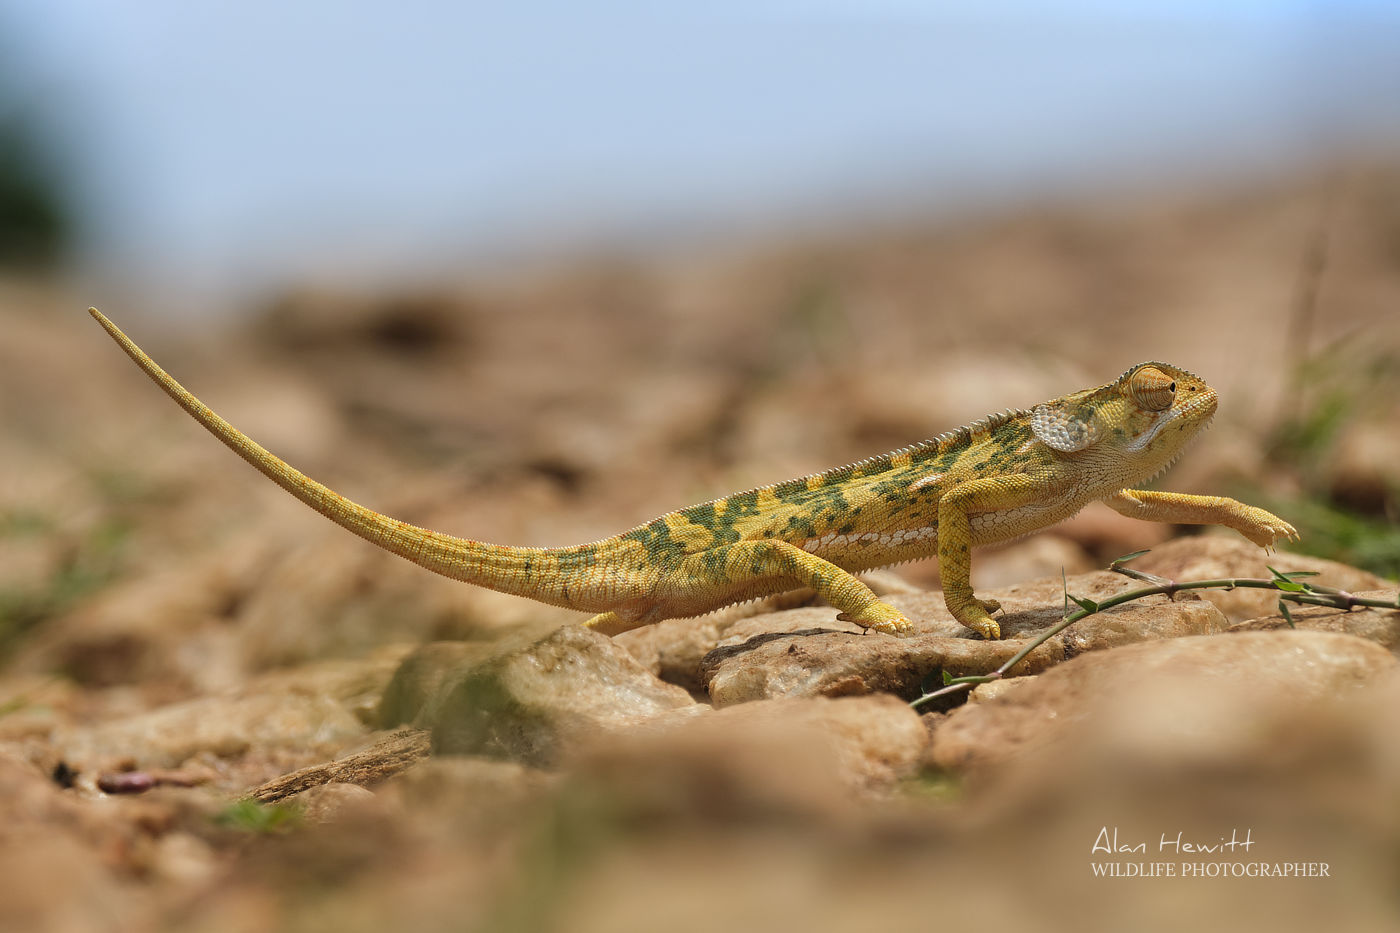 Chameleon X-T4 Alan Hewitt Photography